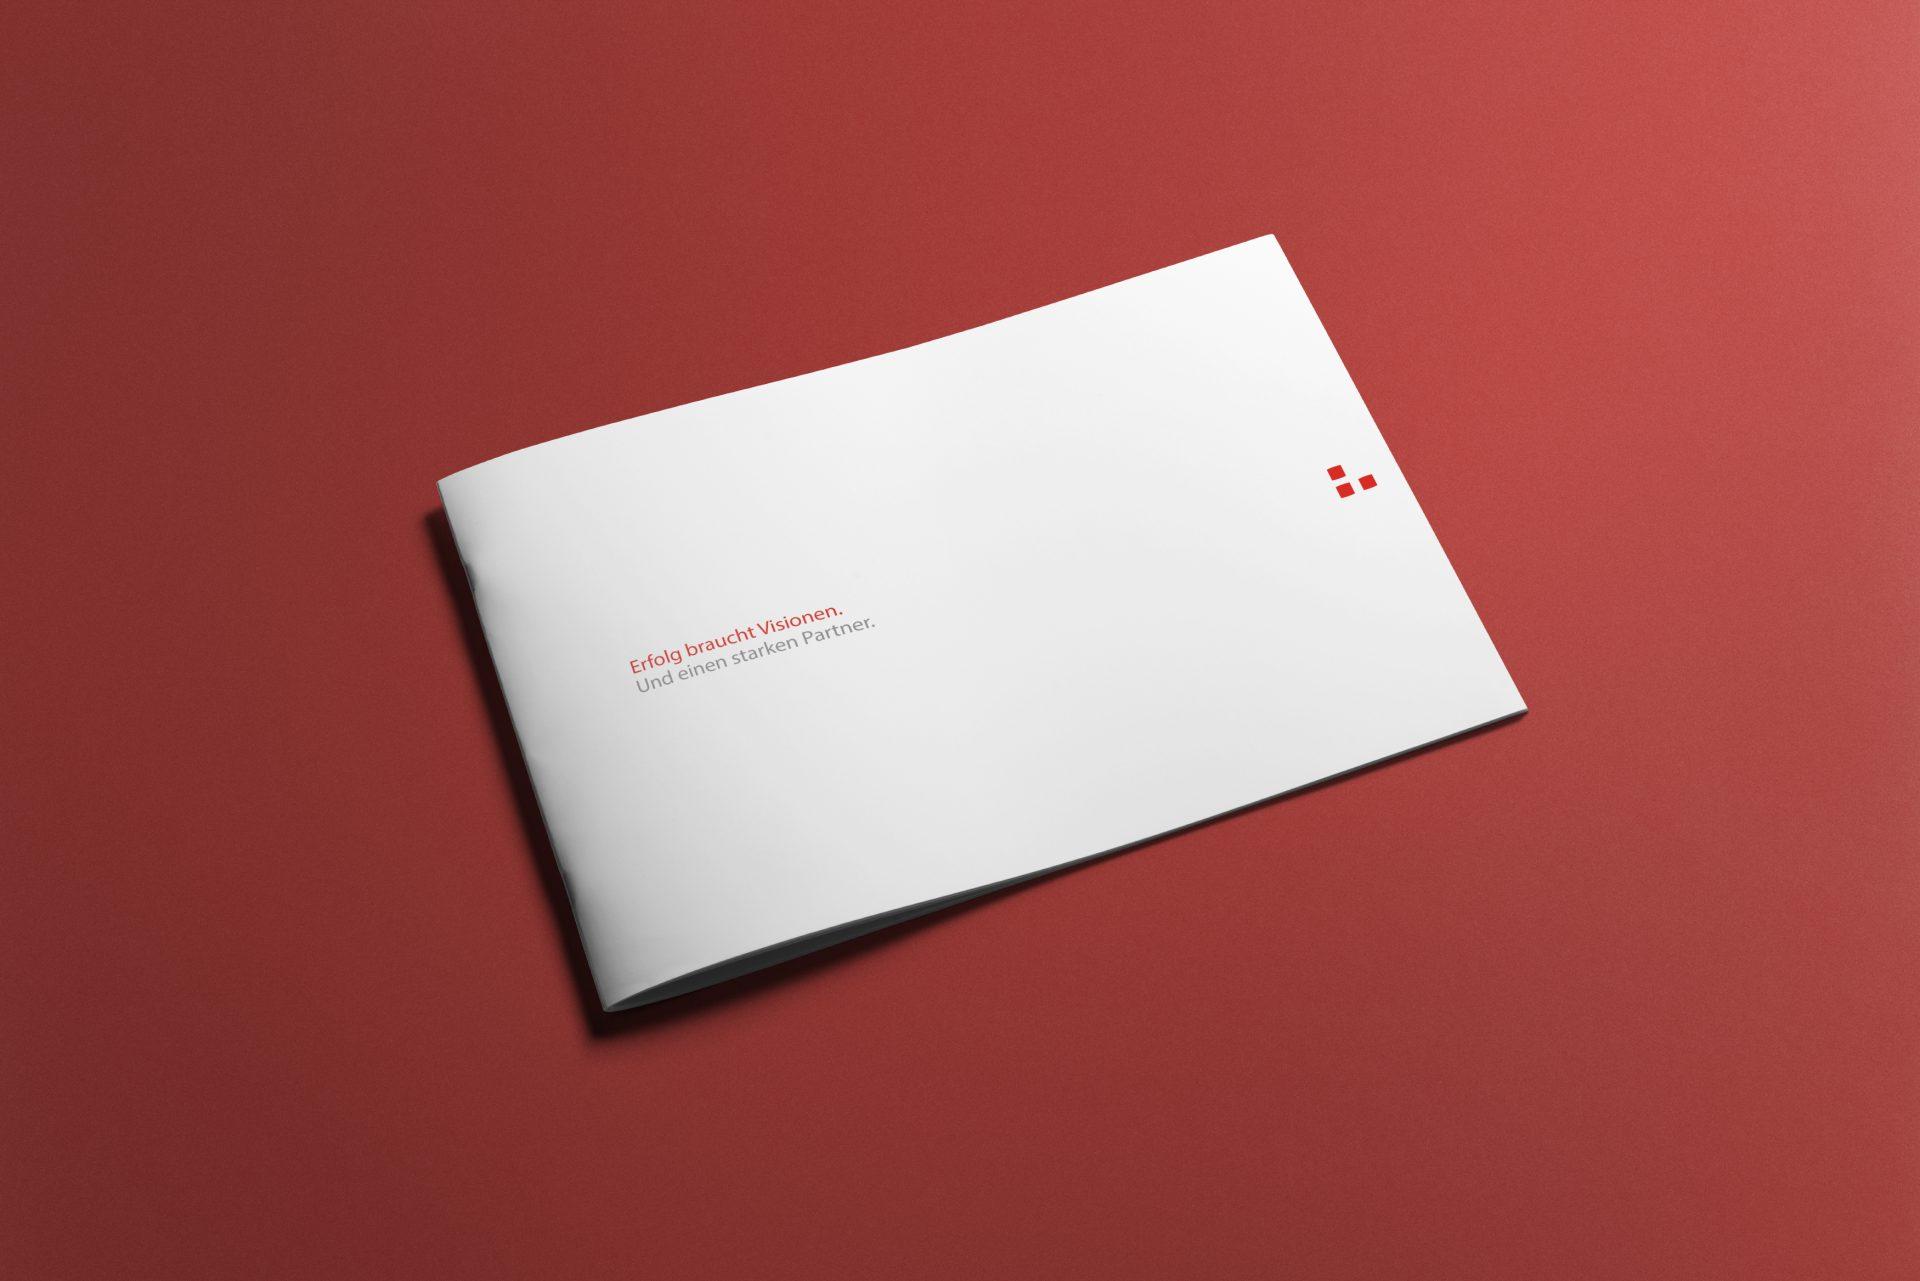 marcator-cover klassische-werbung-referenz